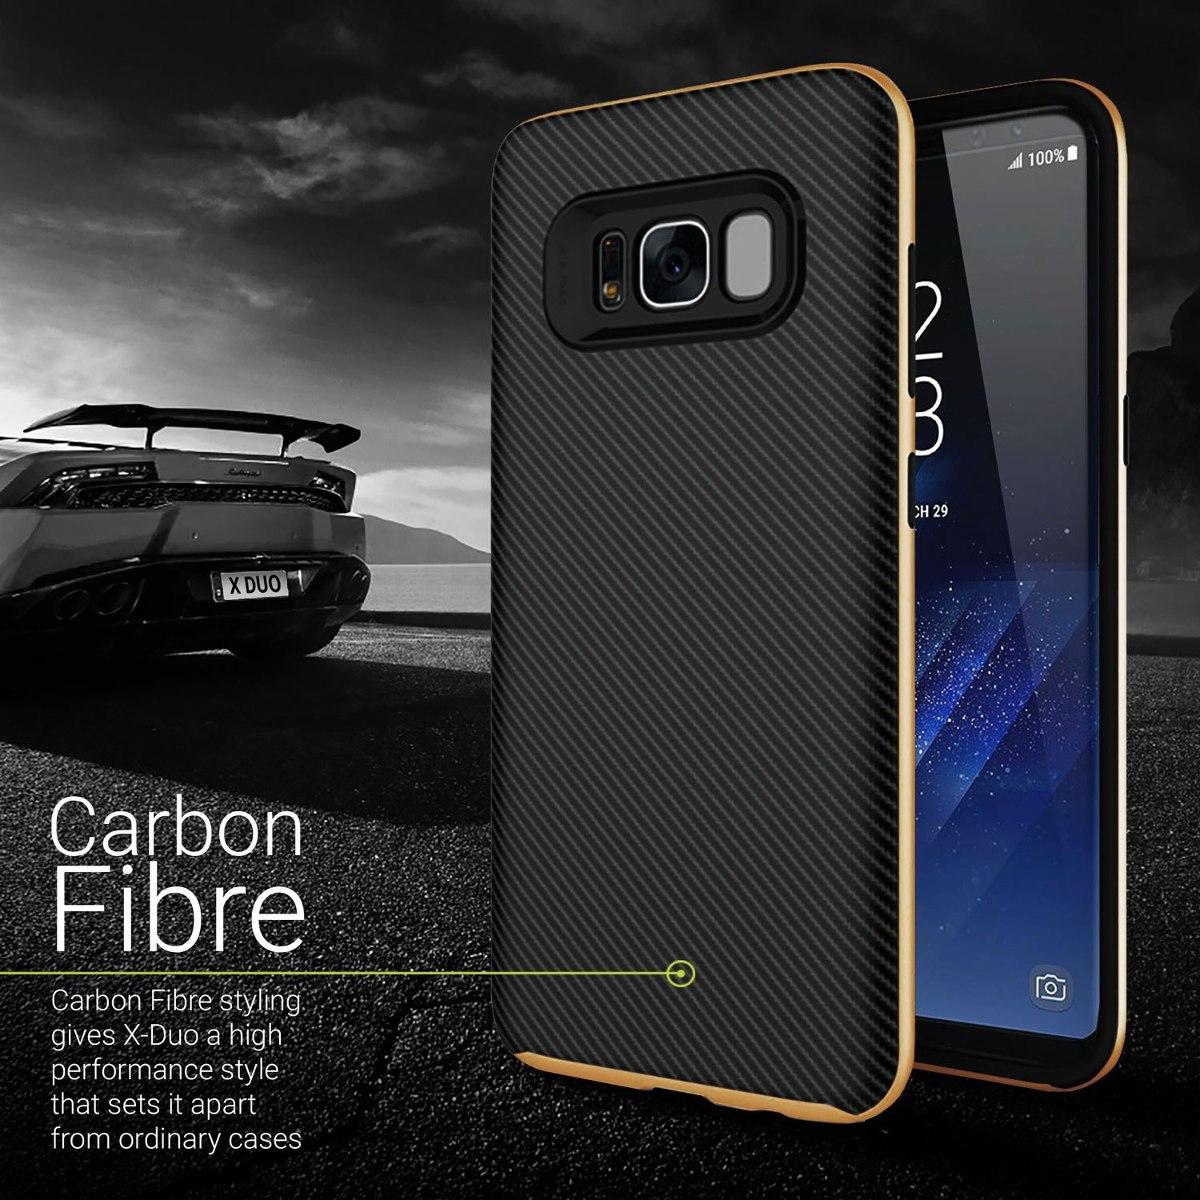 carcasa galaxy s8 fibra de carbono